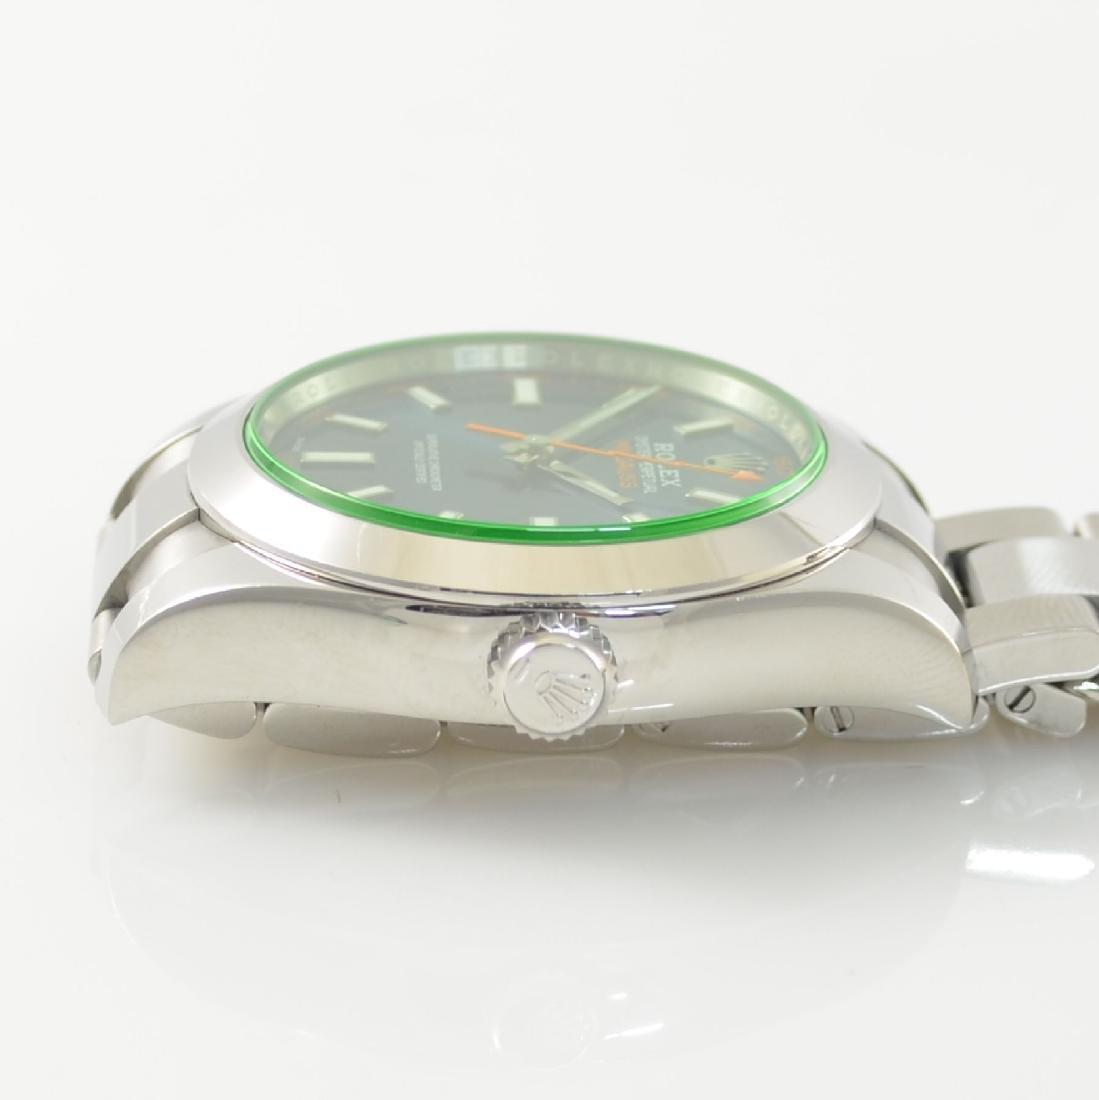 ROLEX wristwatch Oyster Perpetual Milgauss 116400GV - 7